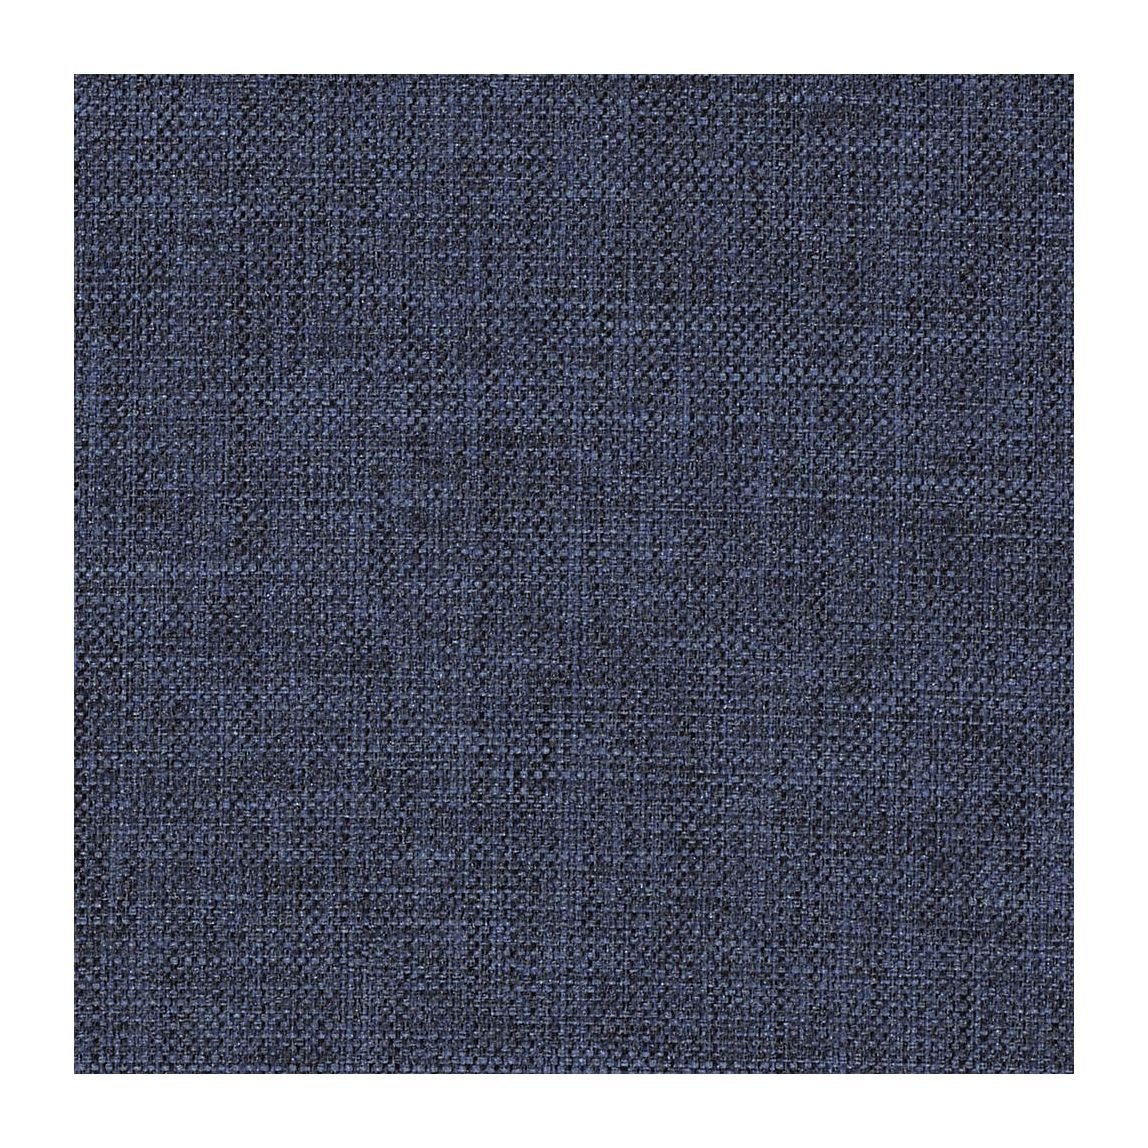 Cover Cloth Indigo Hon Office Furniture